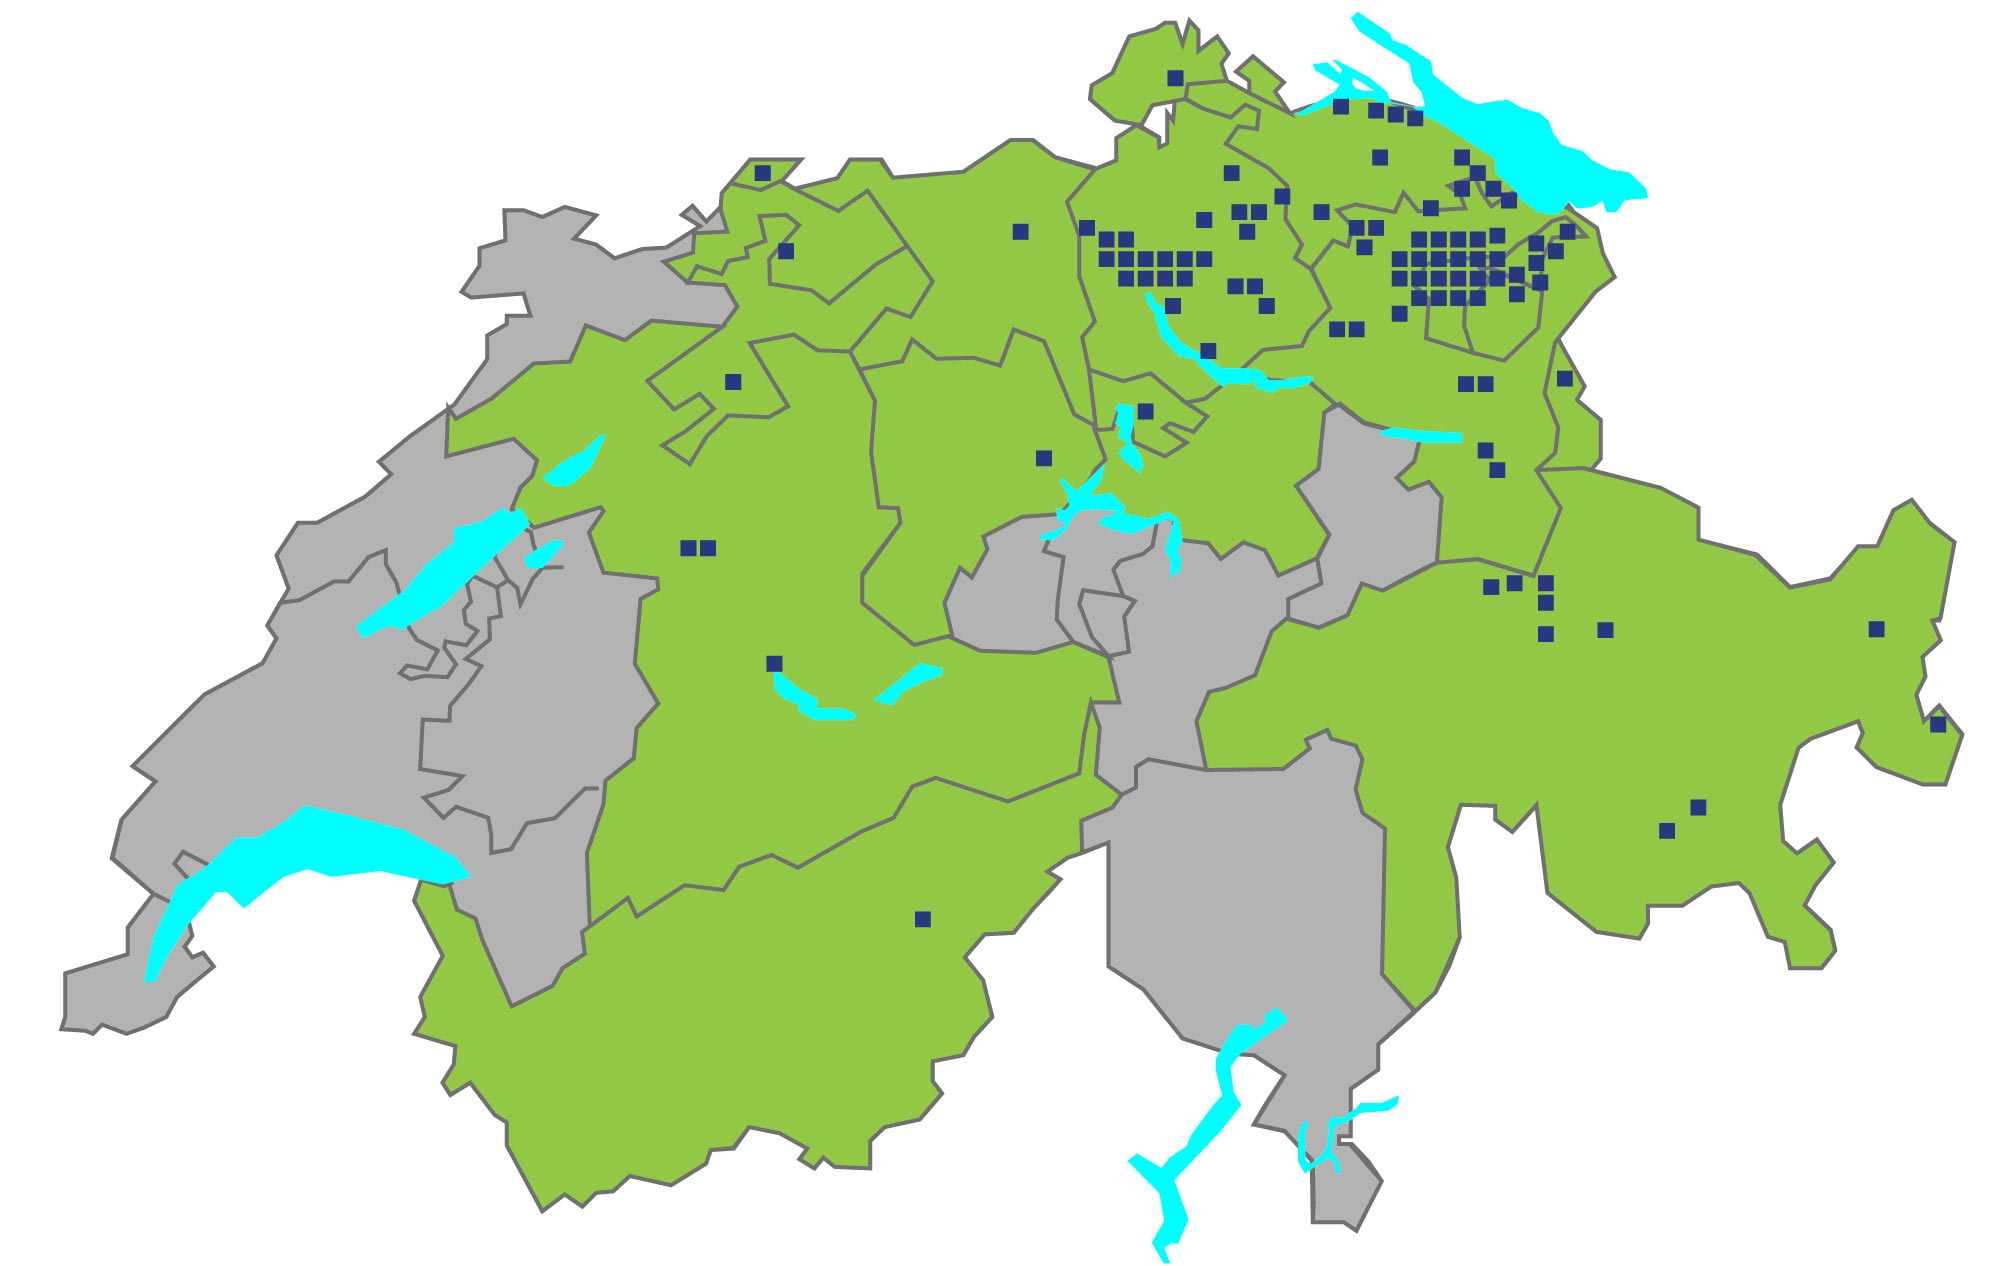 Malaria Karte Thailand.Osir Reise Medizin Infostelle Fur Weltweite Reisemedizin